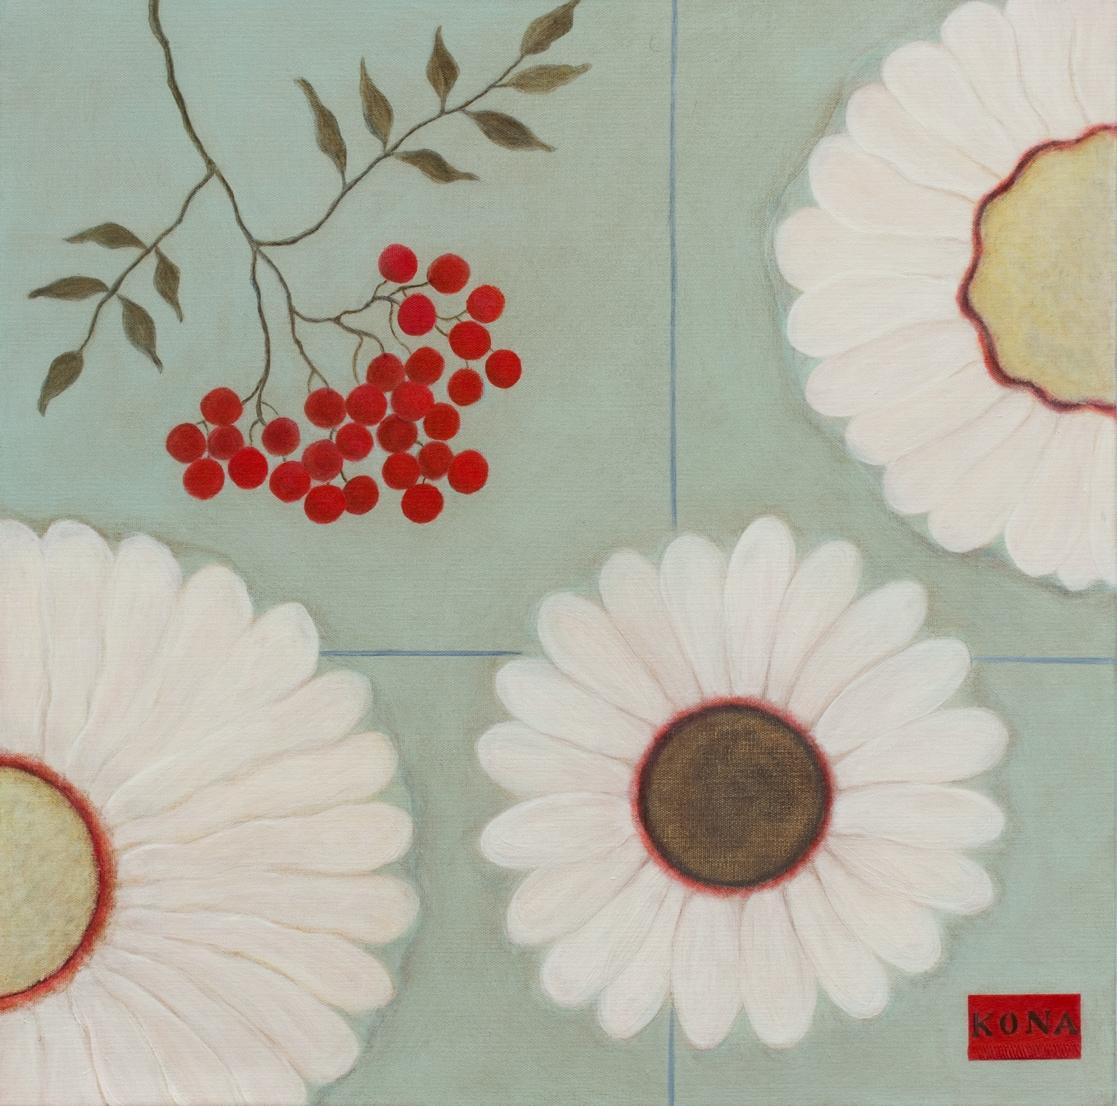 Kona    24 x 24   (Artist's Collection)